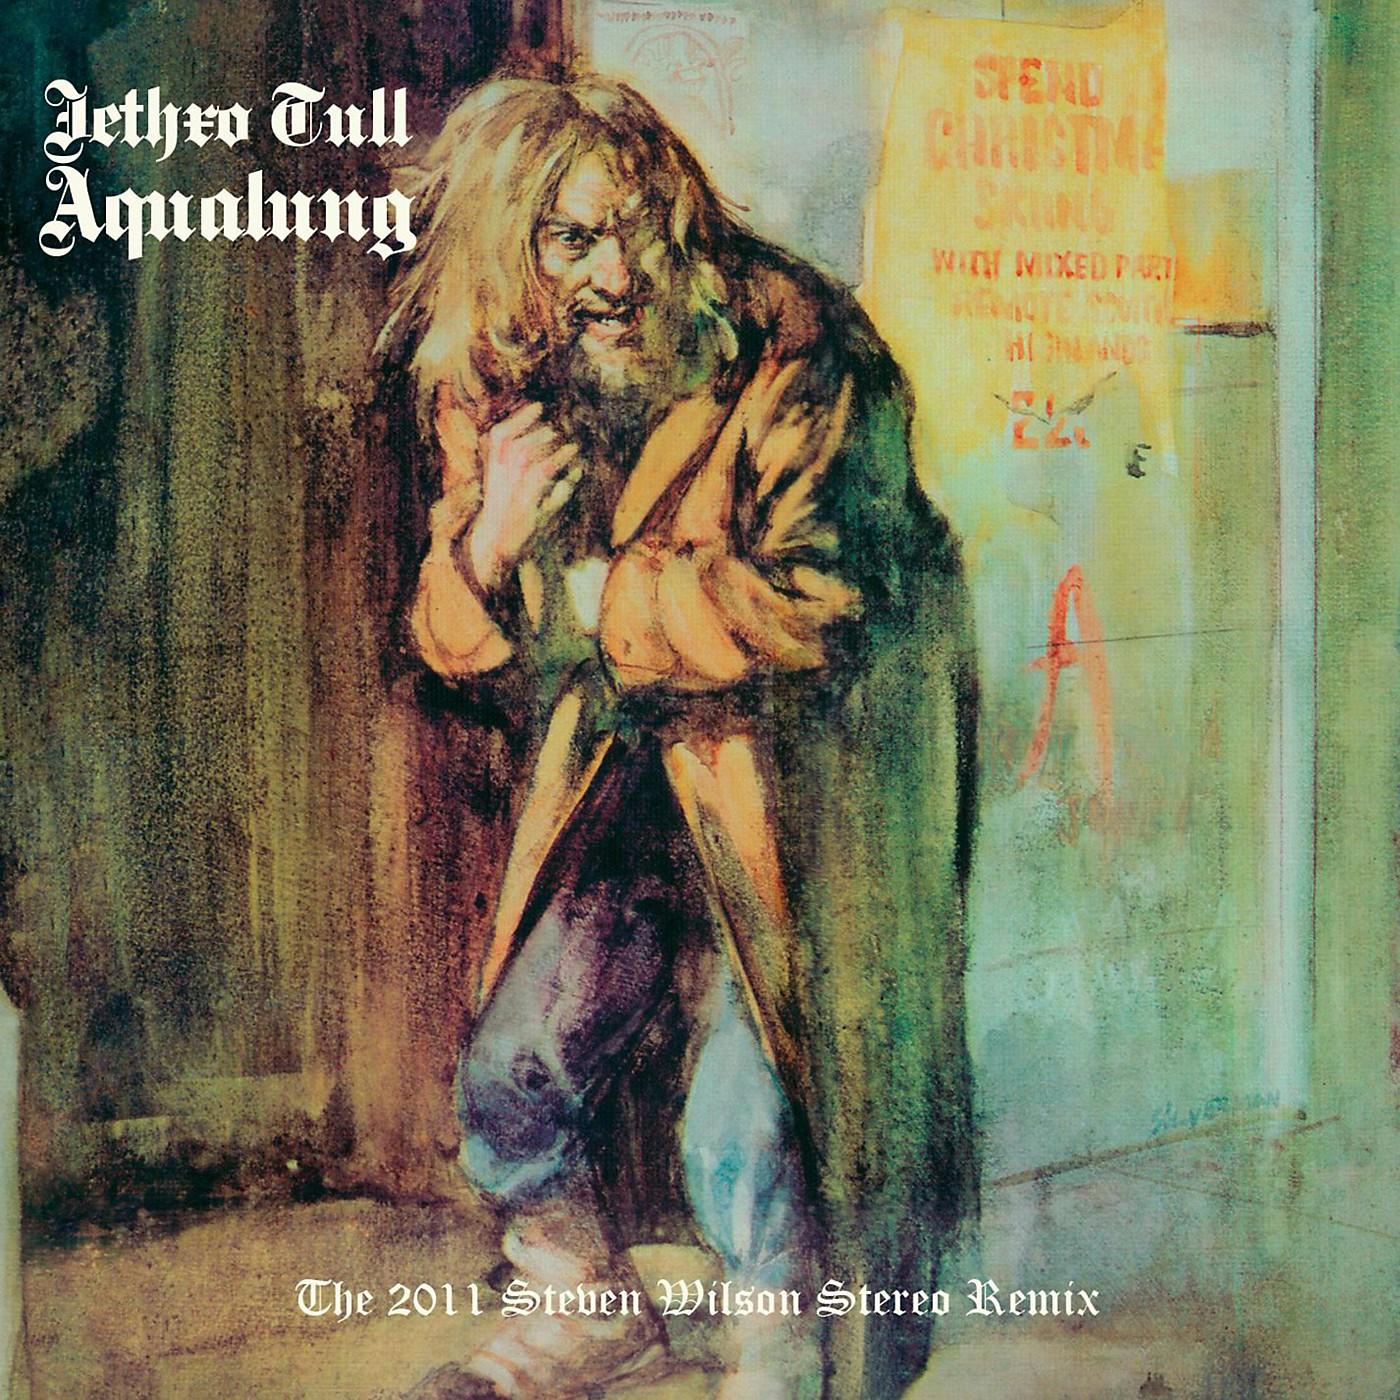 WEA Jethro Tull - Aqualung (Steven Wilson Mix) Vinyl LP thumbnail